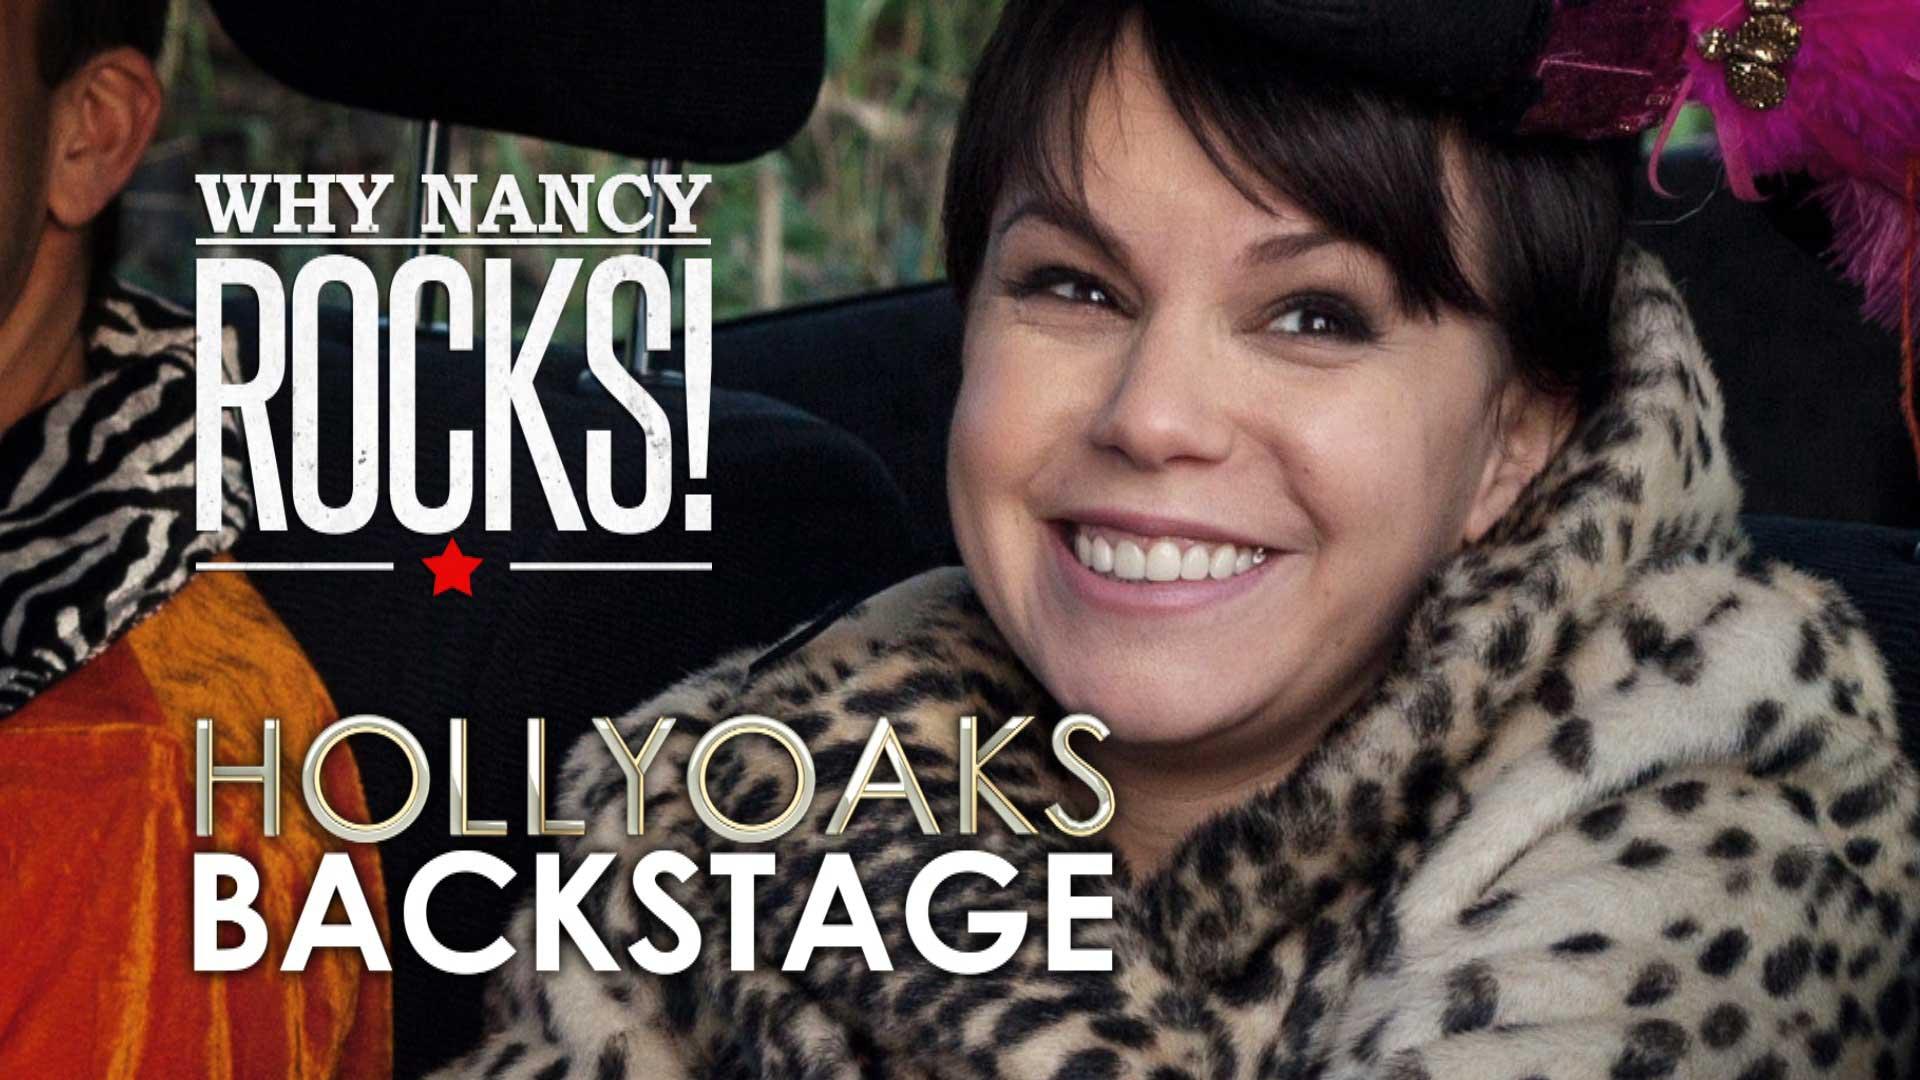 Why Nancy Rocks!